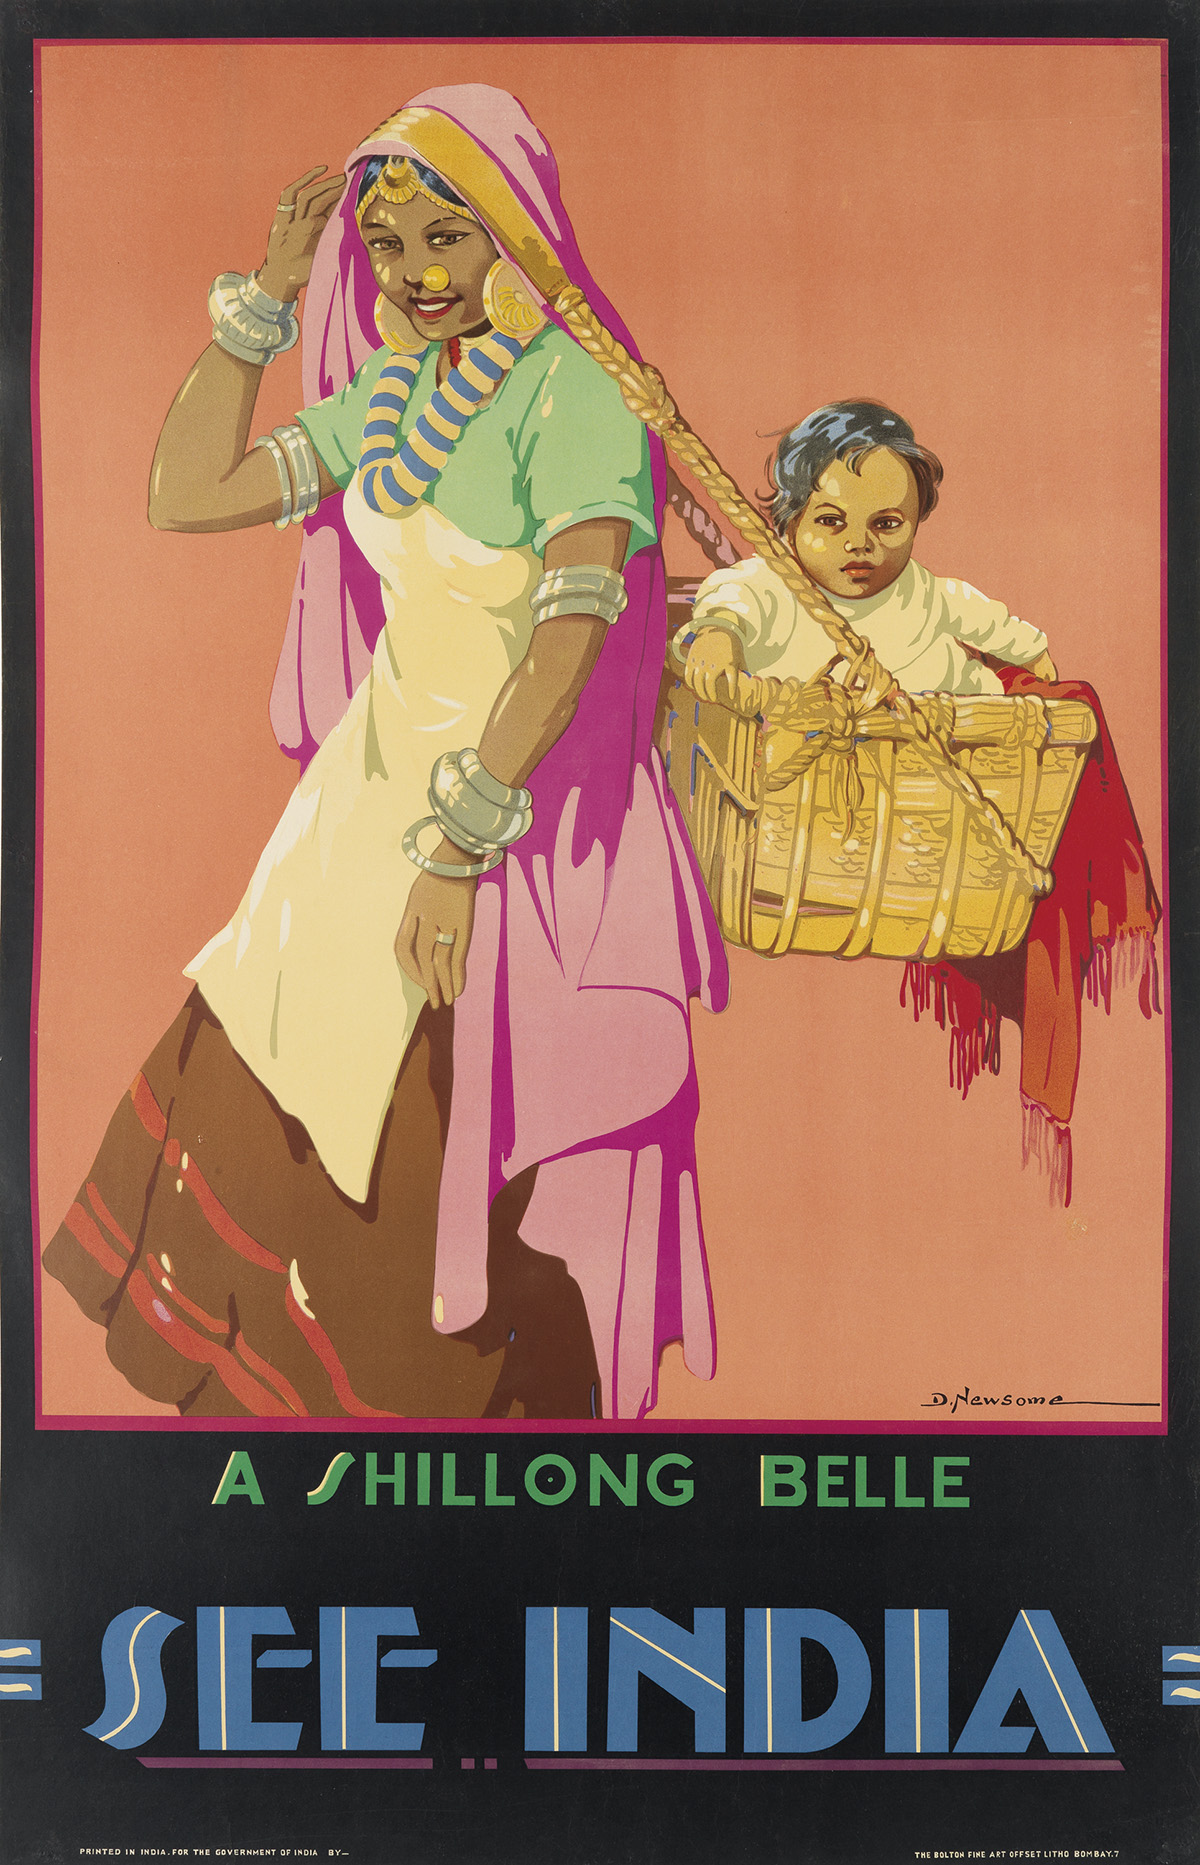 DOROTHY-NEWSOME-(CIRCA-1900-1980)-A-SHILLONG-BELLE--SEE-INDI